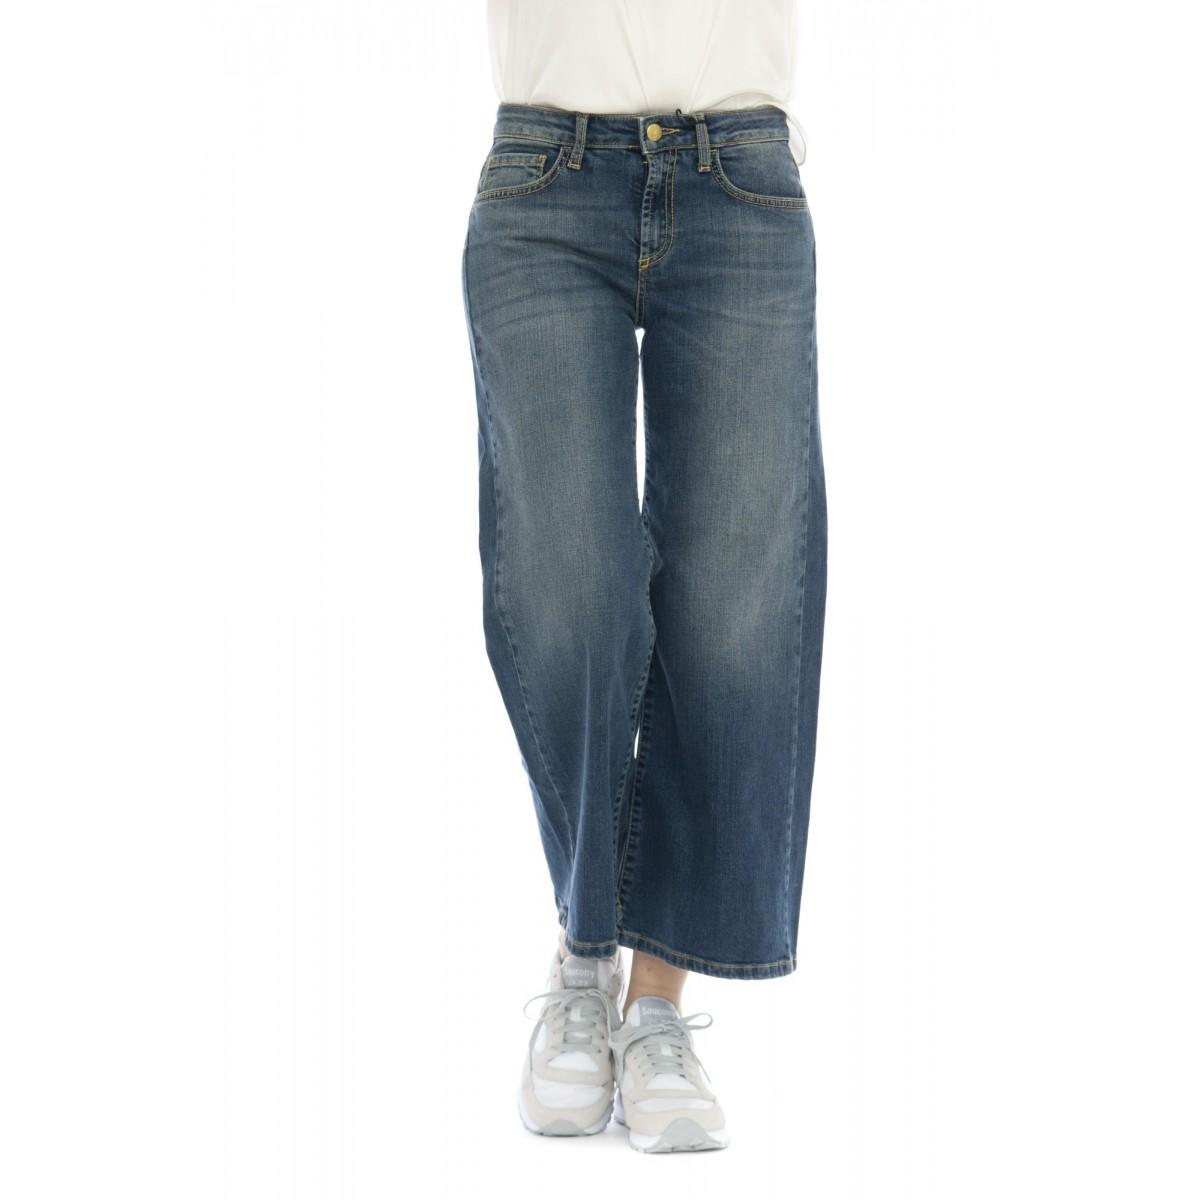 Jeans - Harian vintage jeans